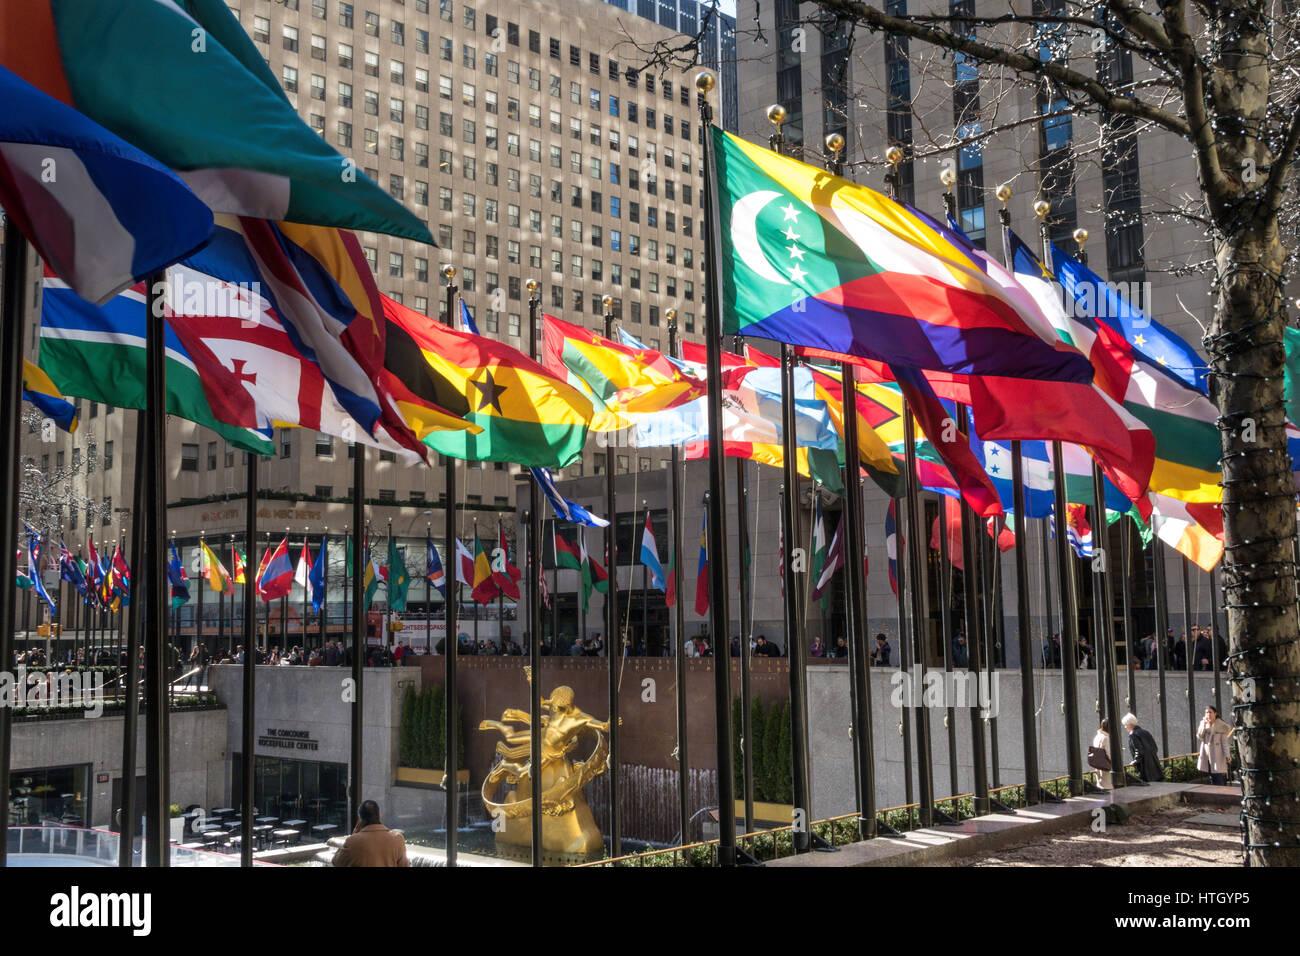 International Nation Flags Displayed at Rockefeller Center, NYC, USA - Stock Image